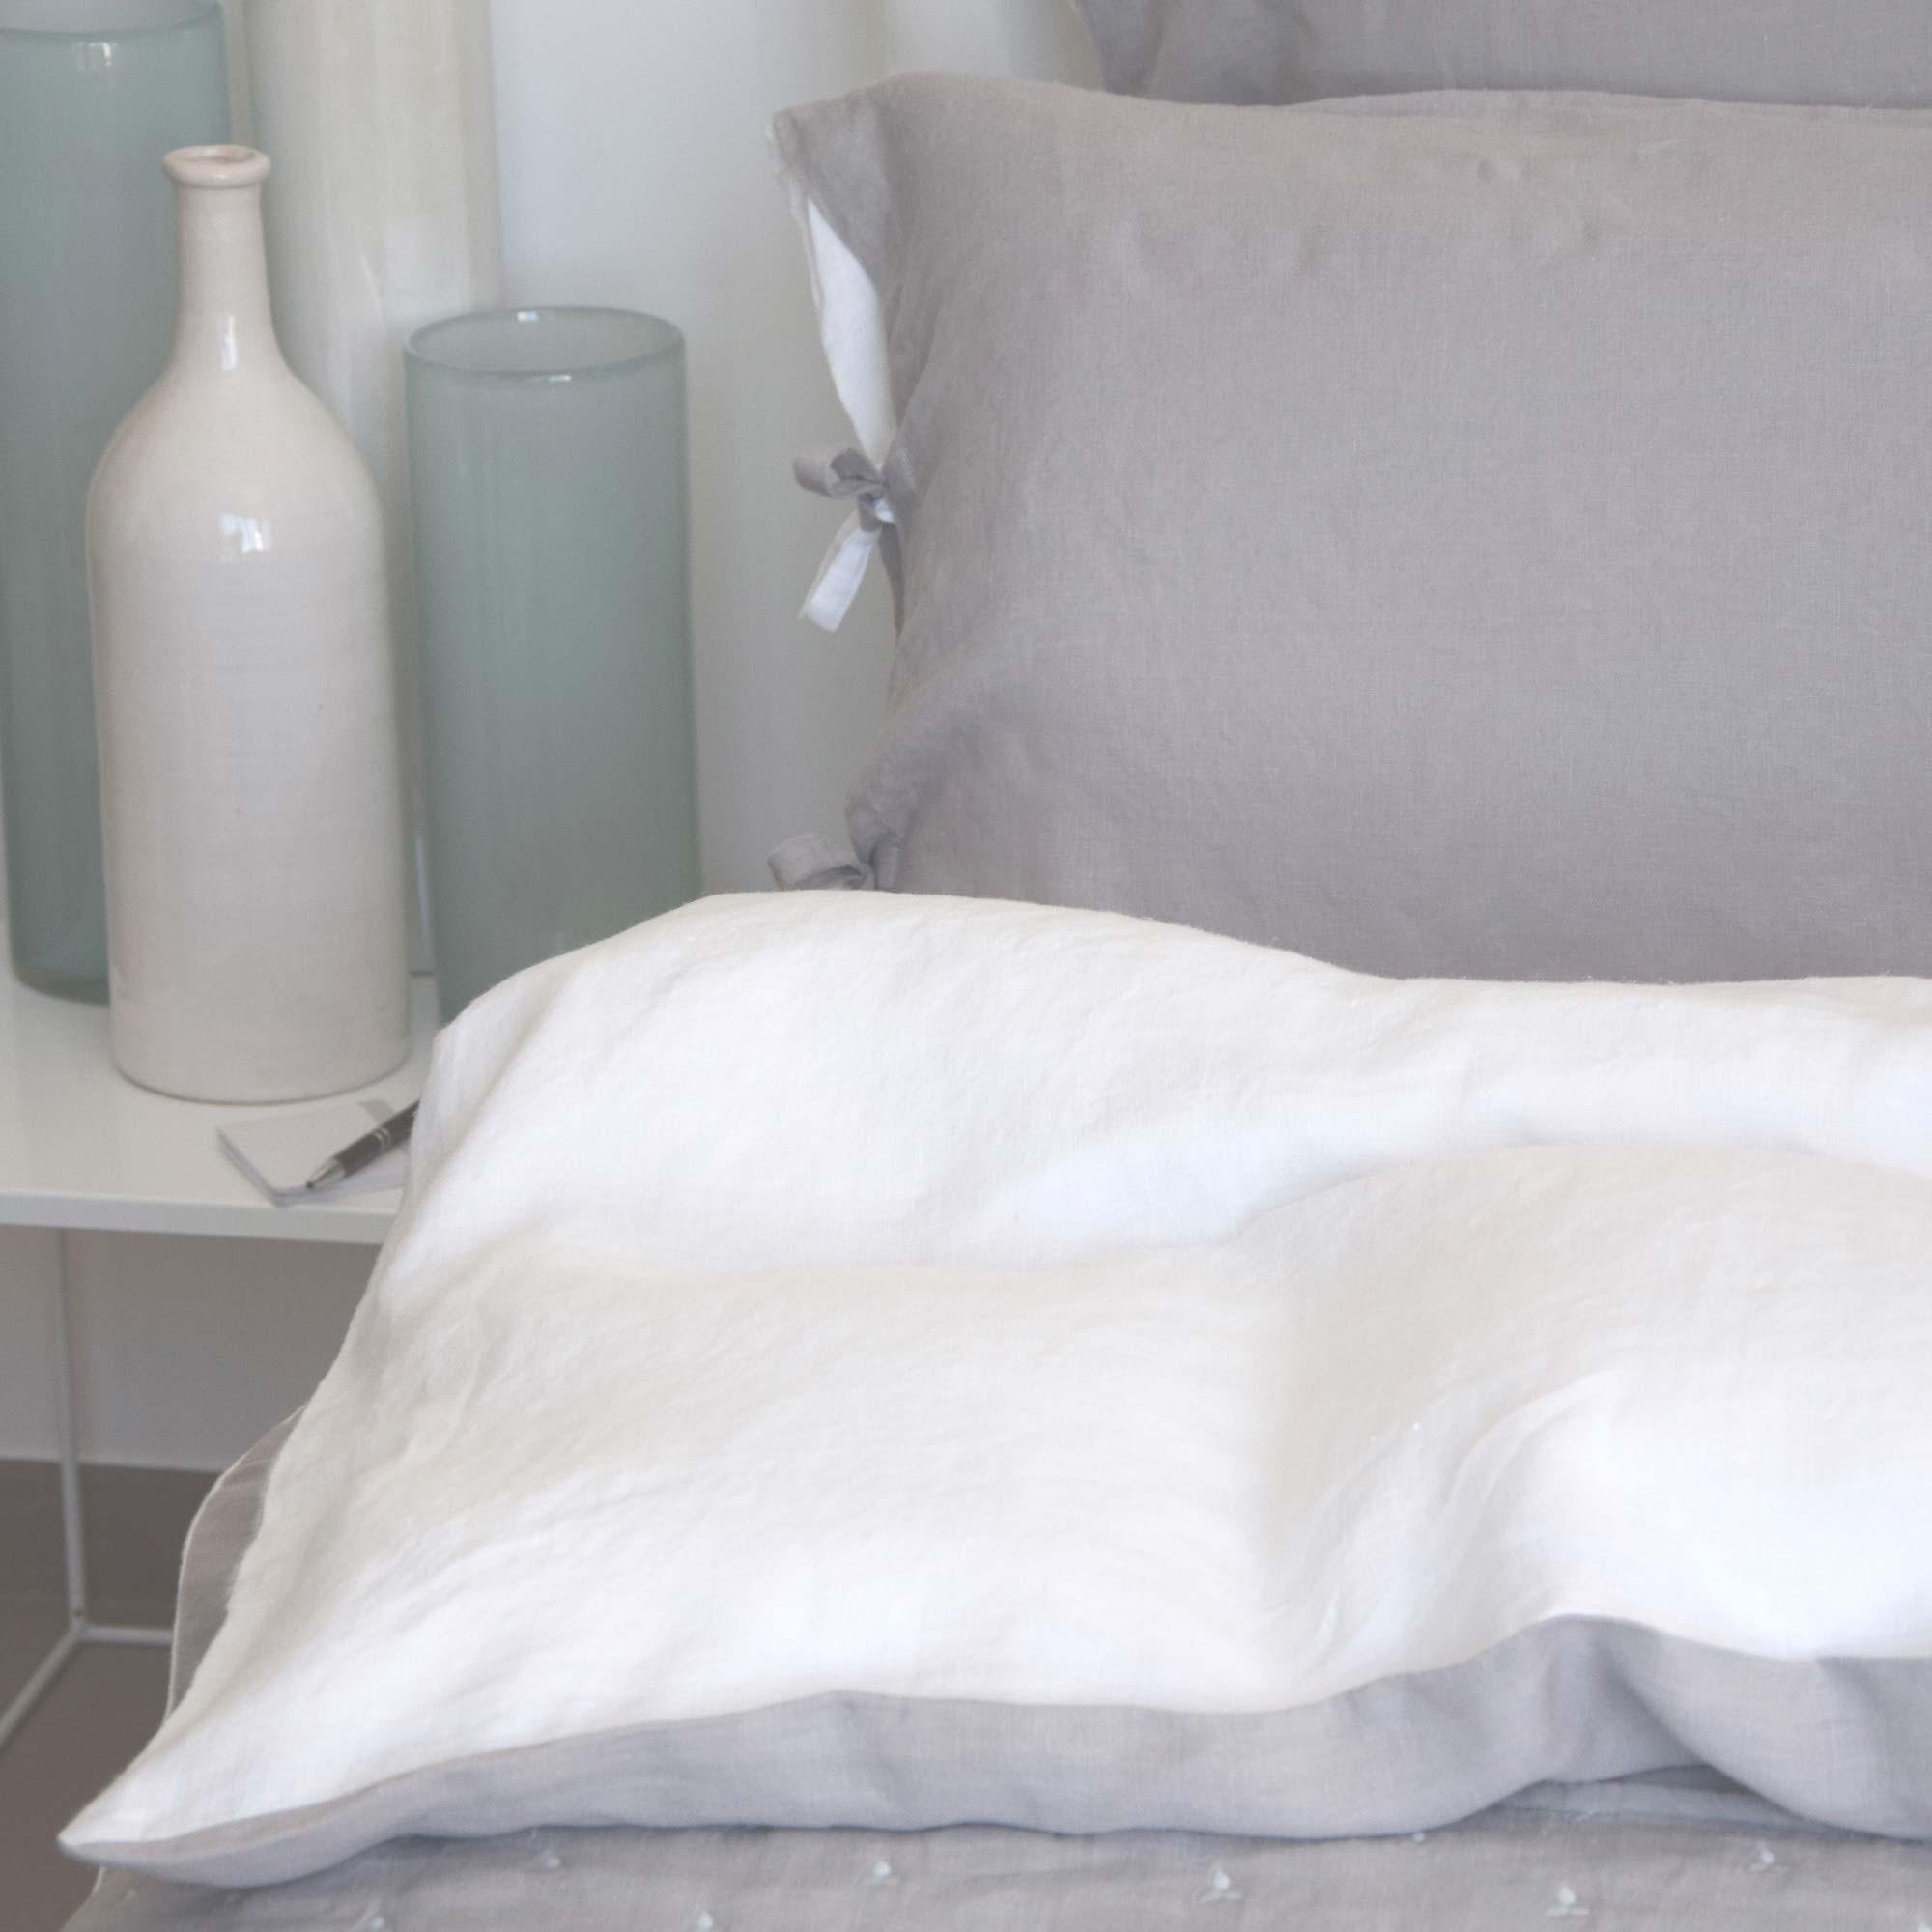 housse de couette bicolore coloris percale jalla framboise m re pictures to pin on pinterest. Black Bedroom Furniture Sets. Home Design Ideas